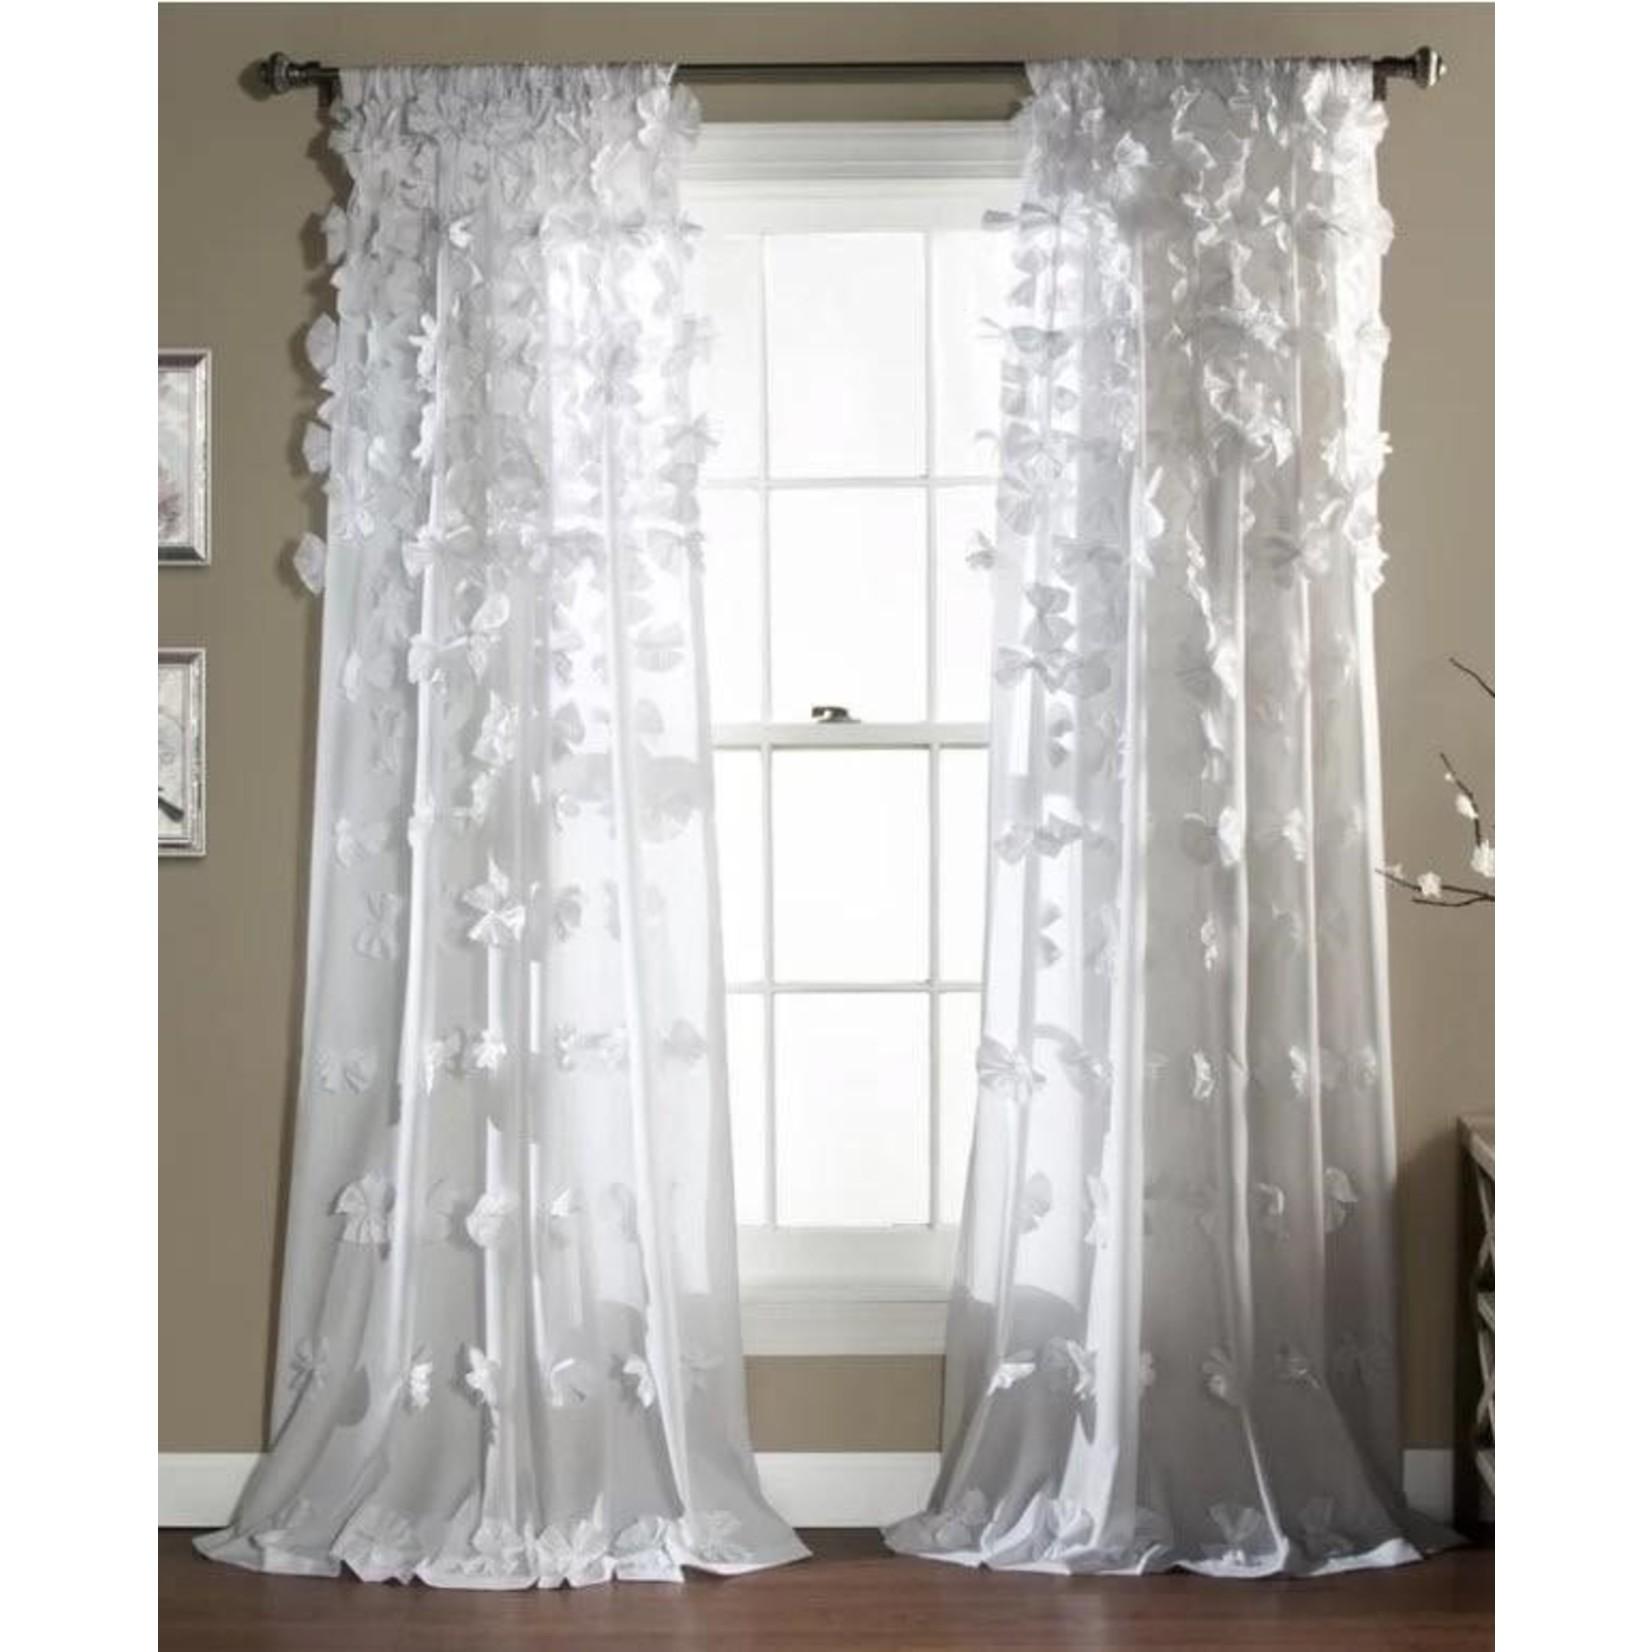 "*54"" x 84"" - Clarkstown Rod Pocket Single Curtain Panel"